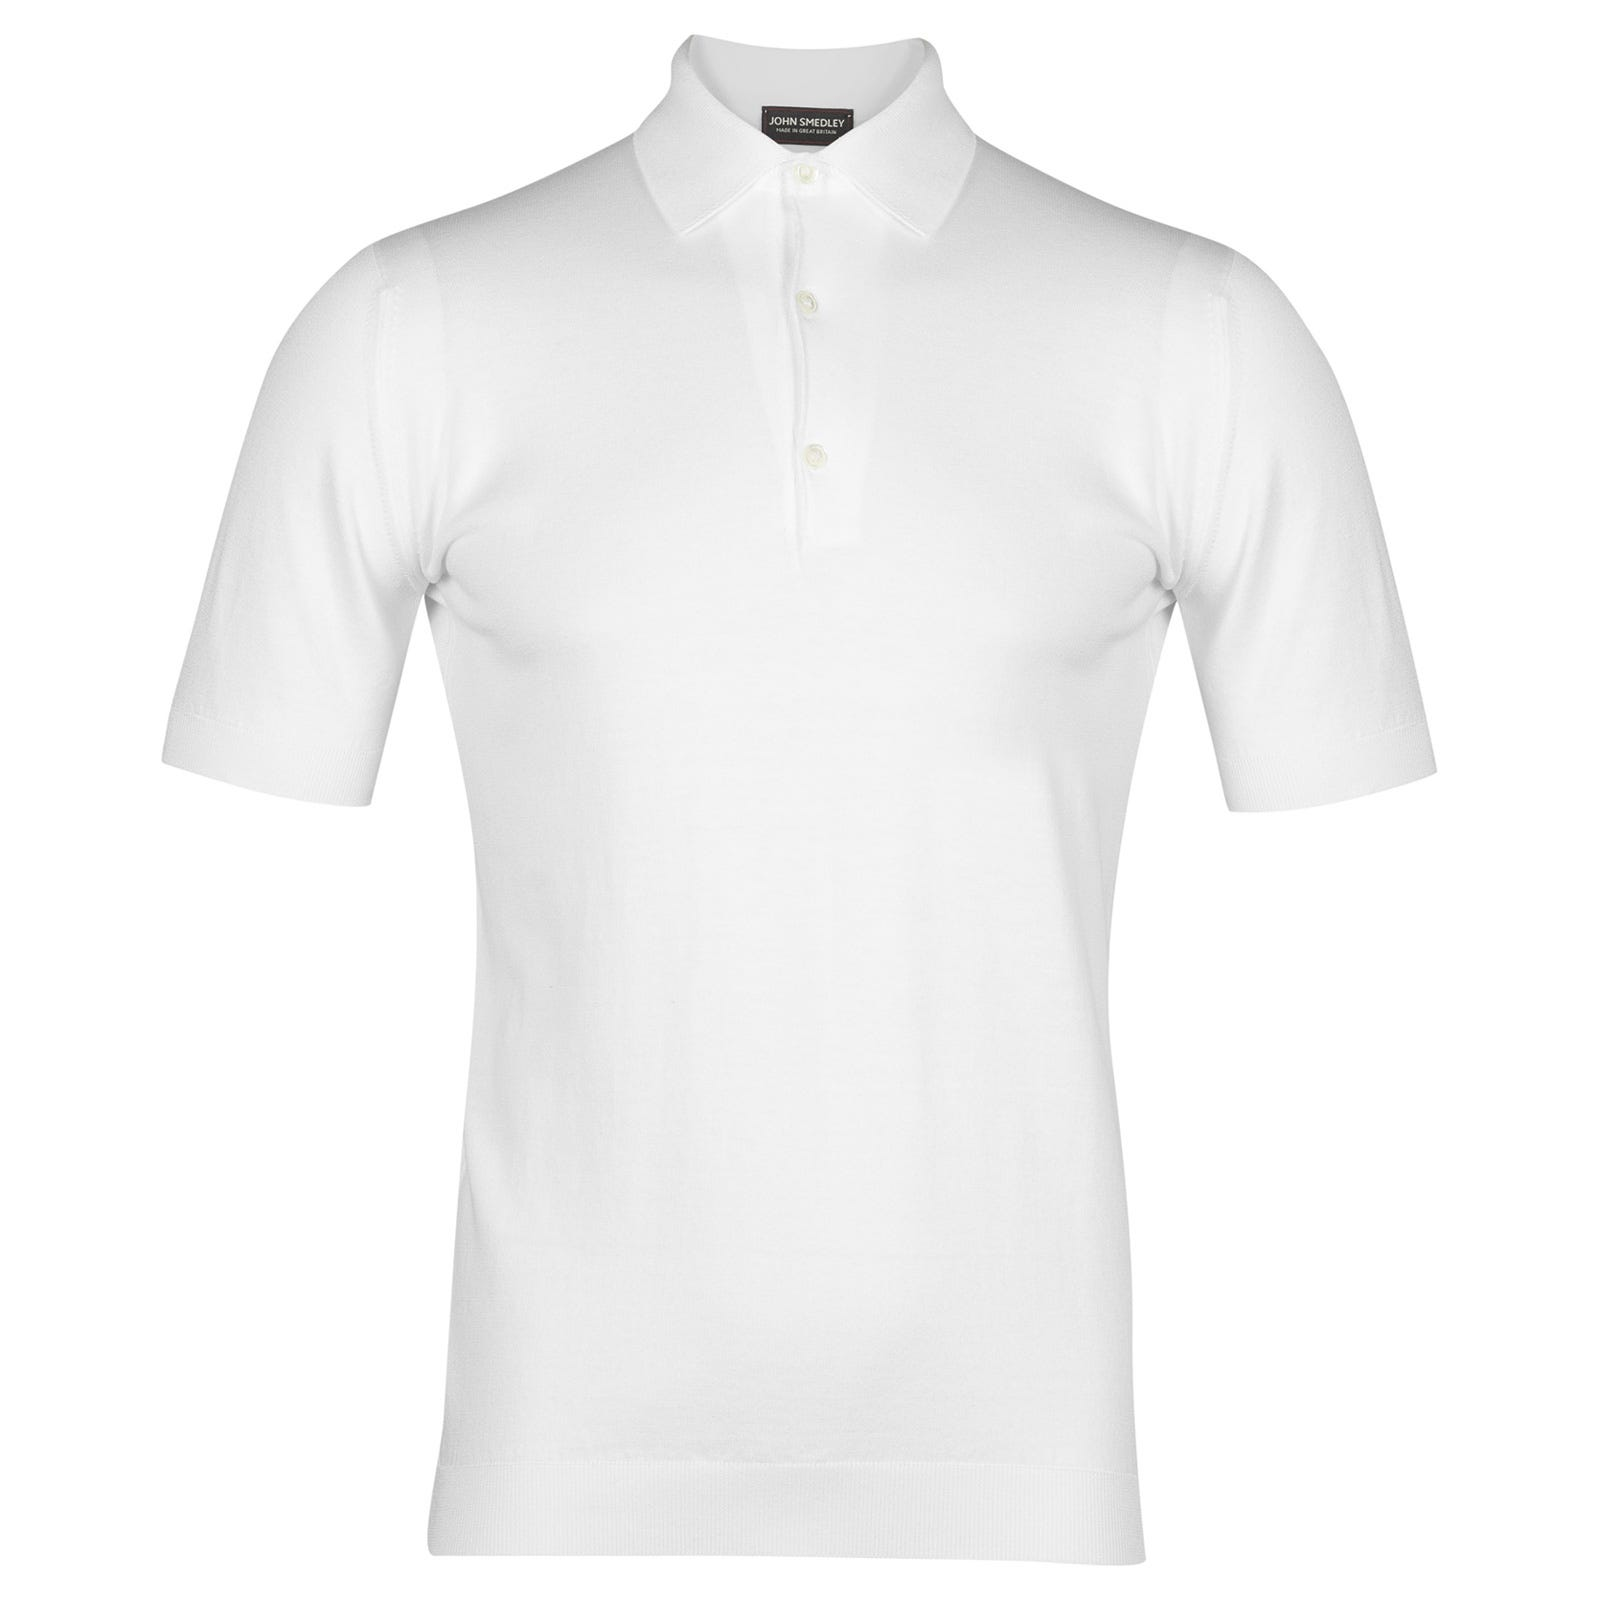 John Smedley adrian Sea Island Cotton Shirt in white-XXL